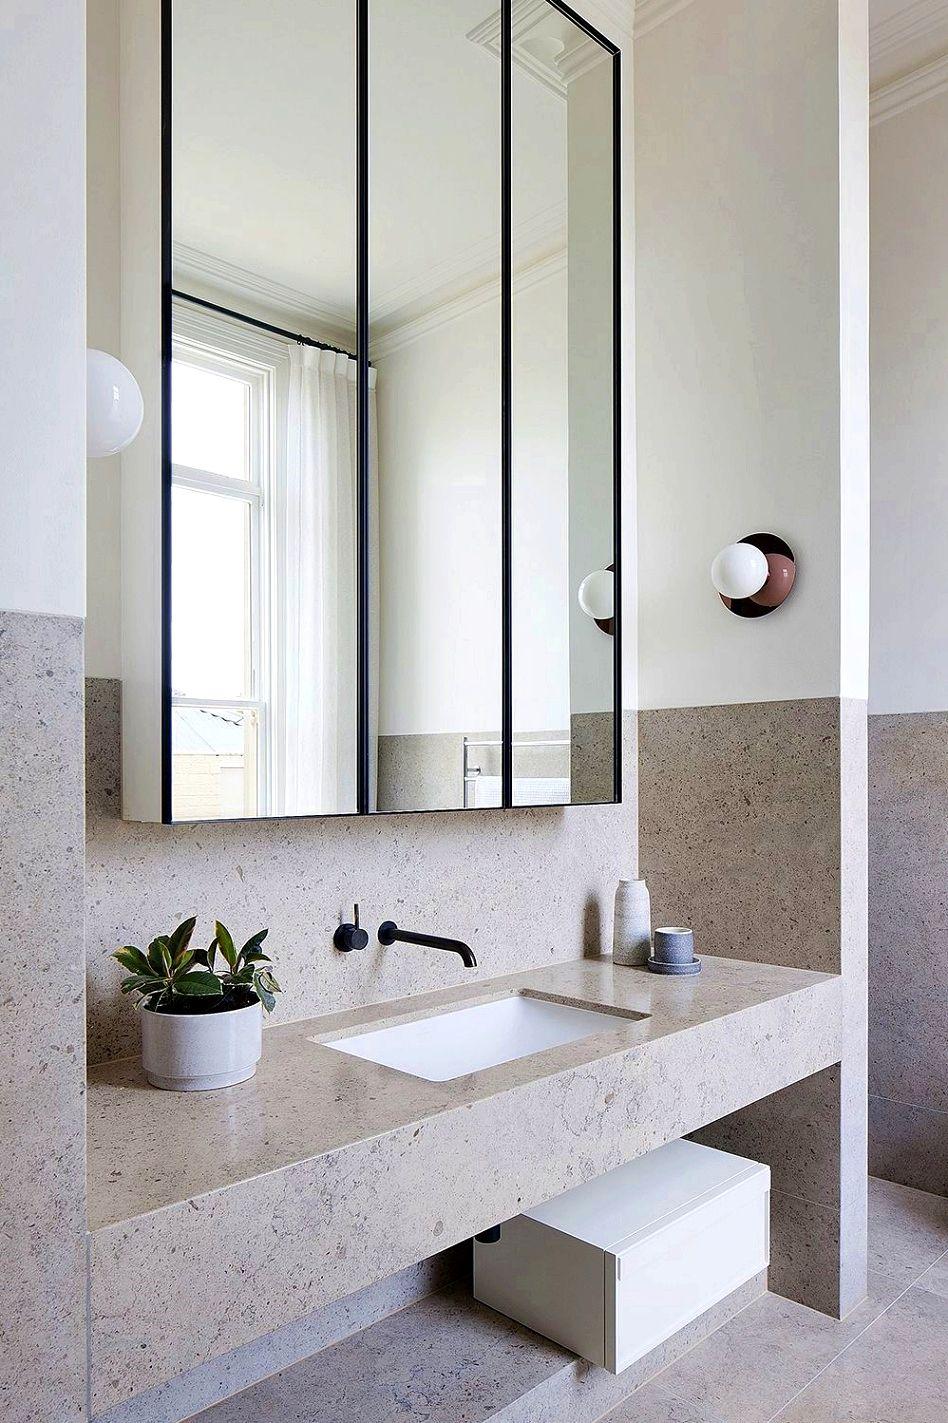 Bathroom Design Decor 7 Great Ideas For Your Bathroom Remodel